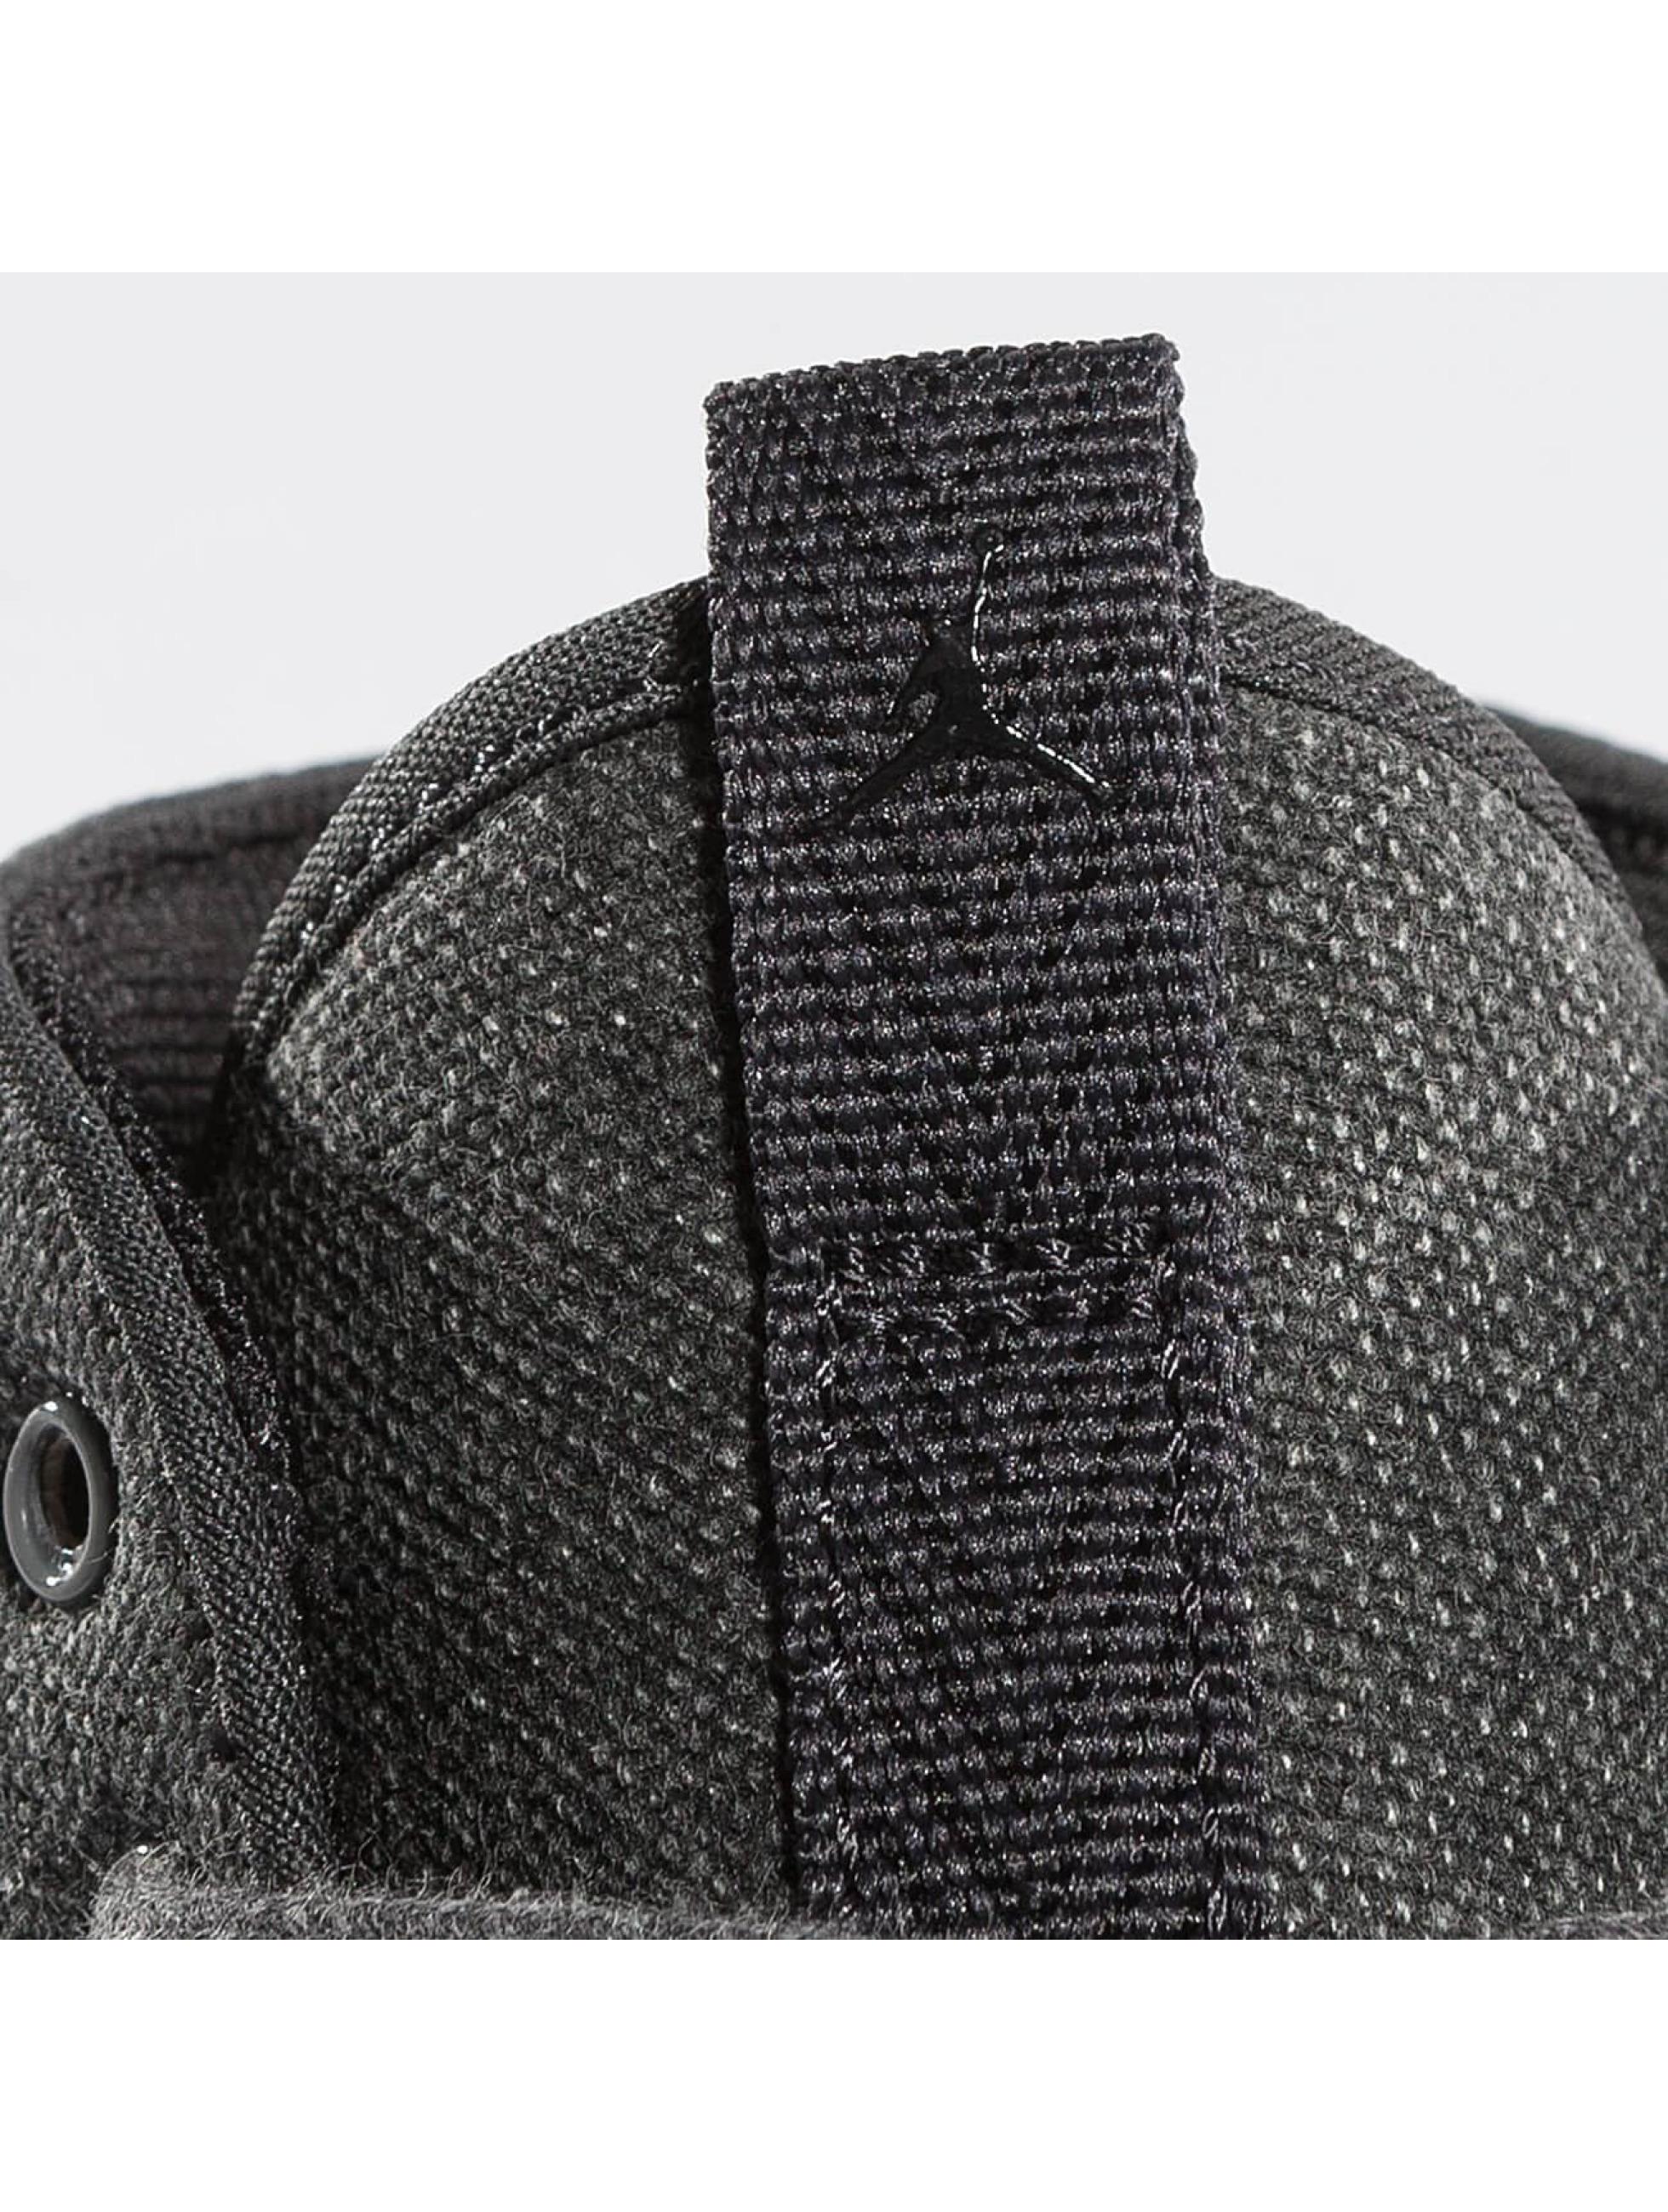 Jordan Sneakers Eclipse Chukka grey